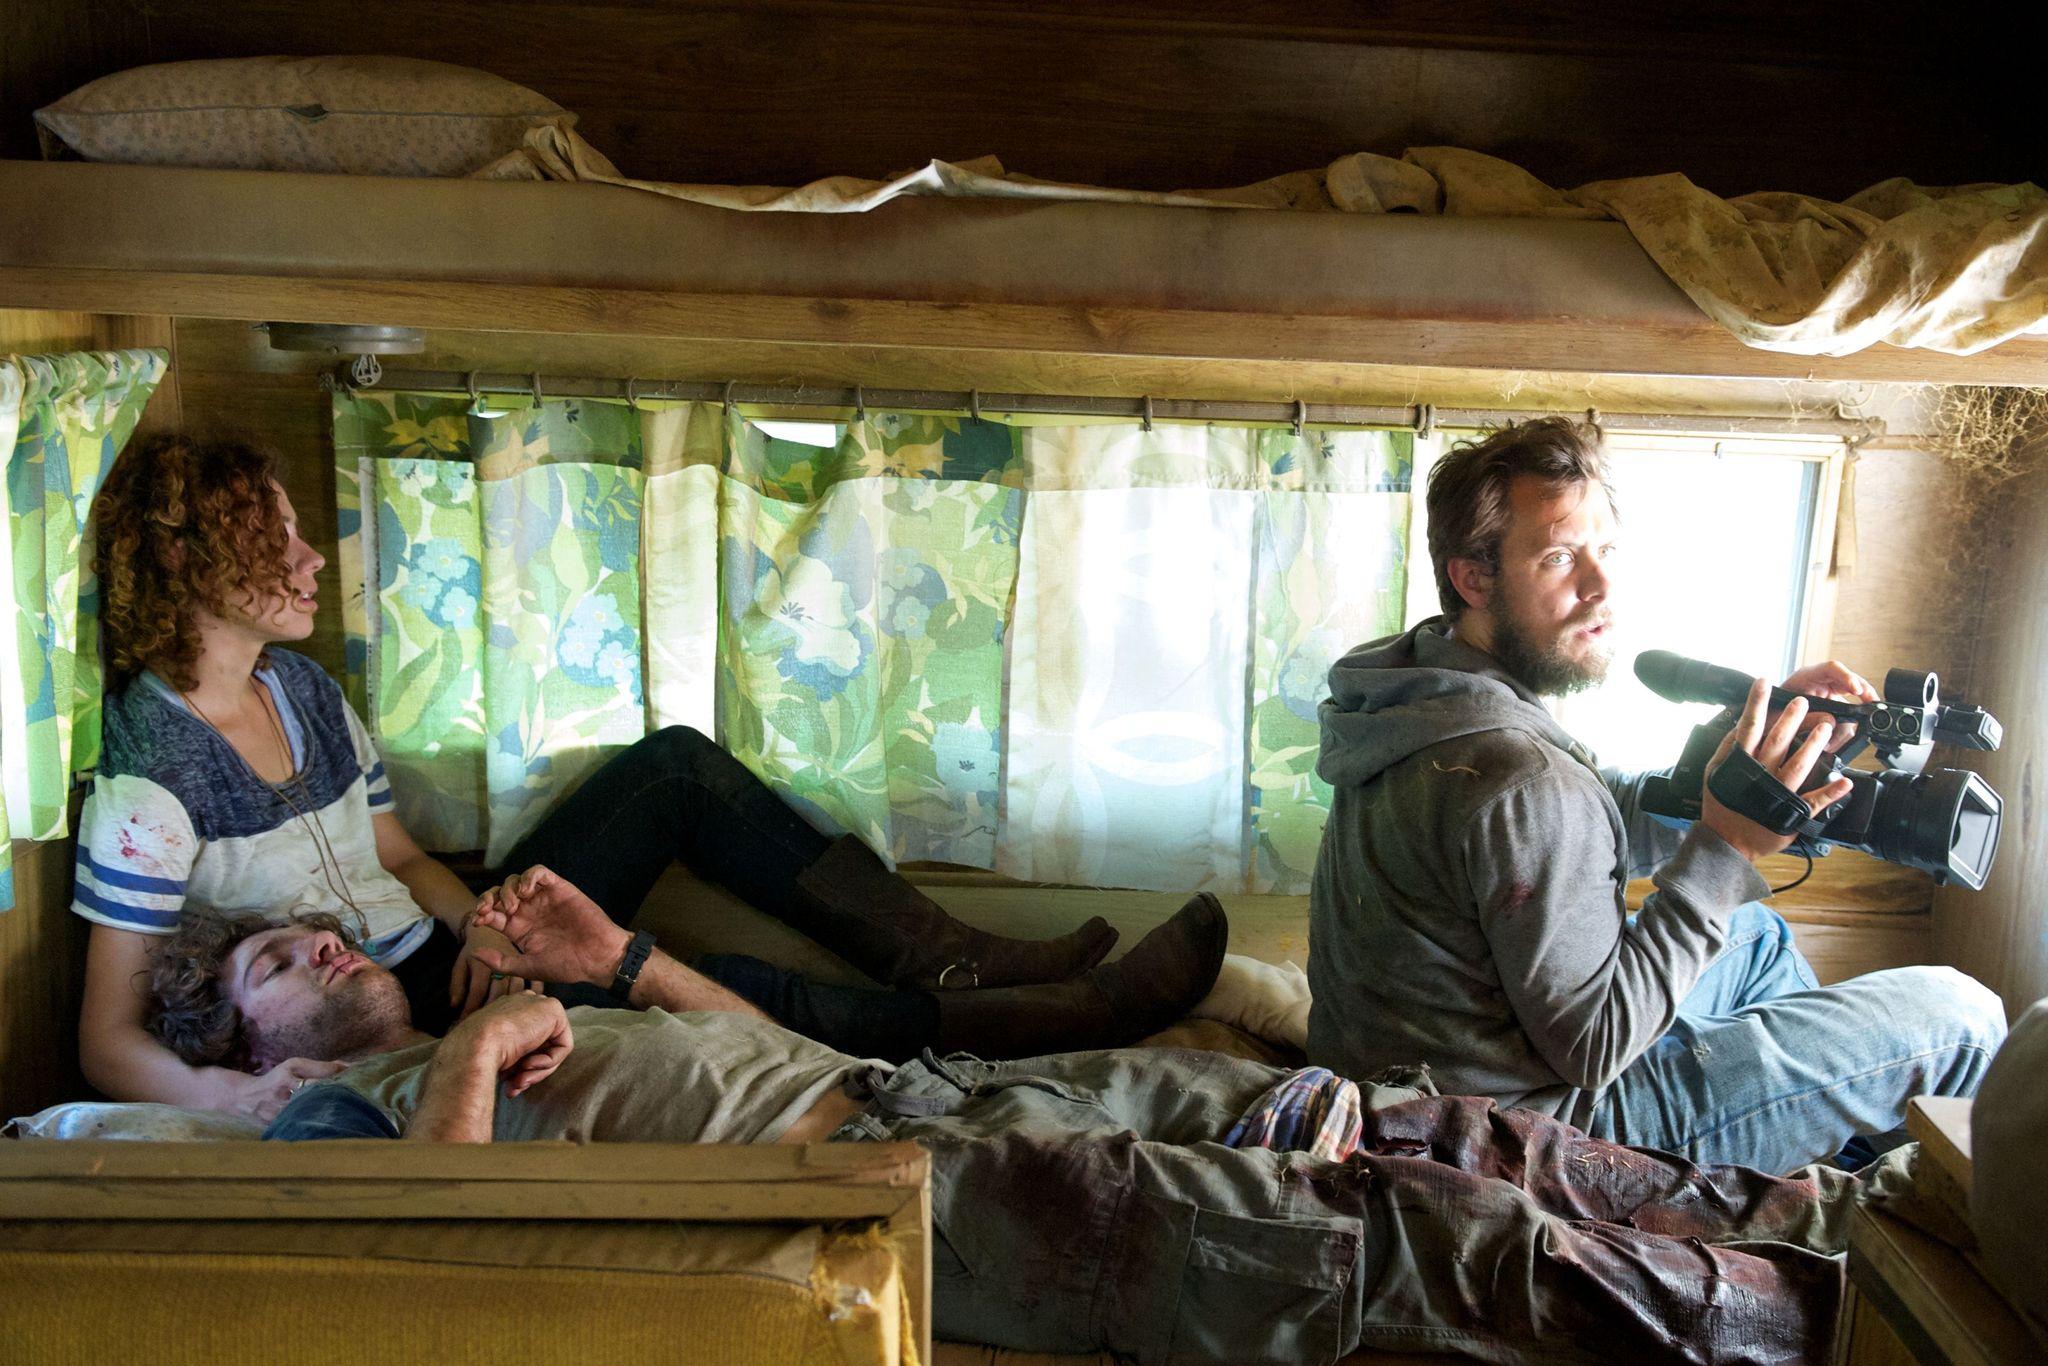 Dora Madison, Chris Osborn, and Samuel Davis in Exists (2014)